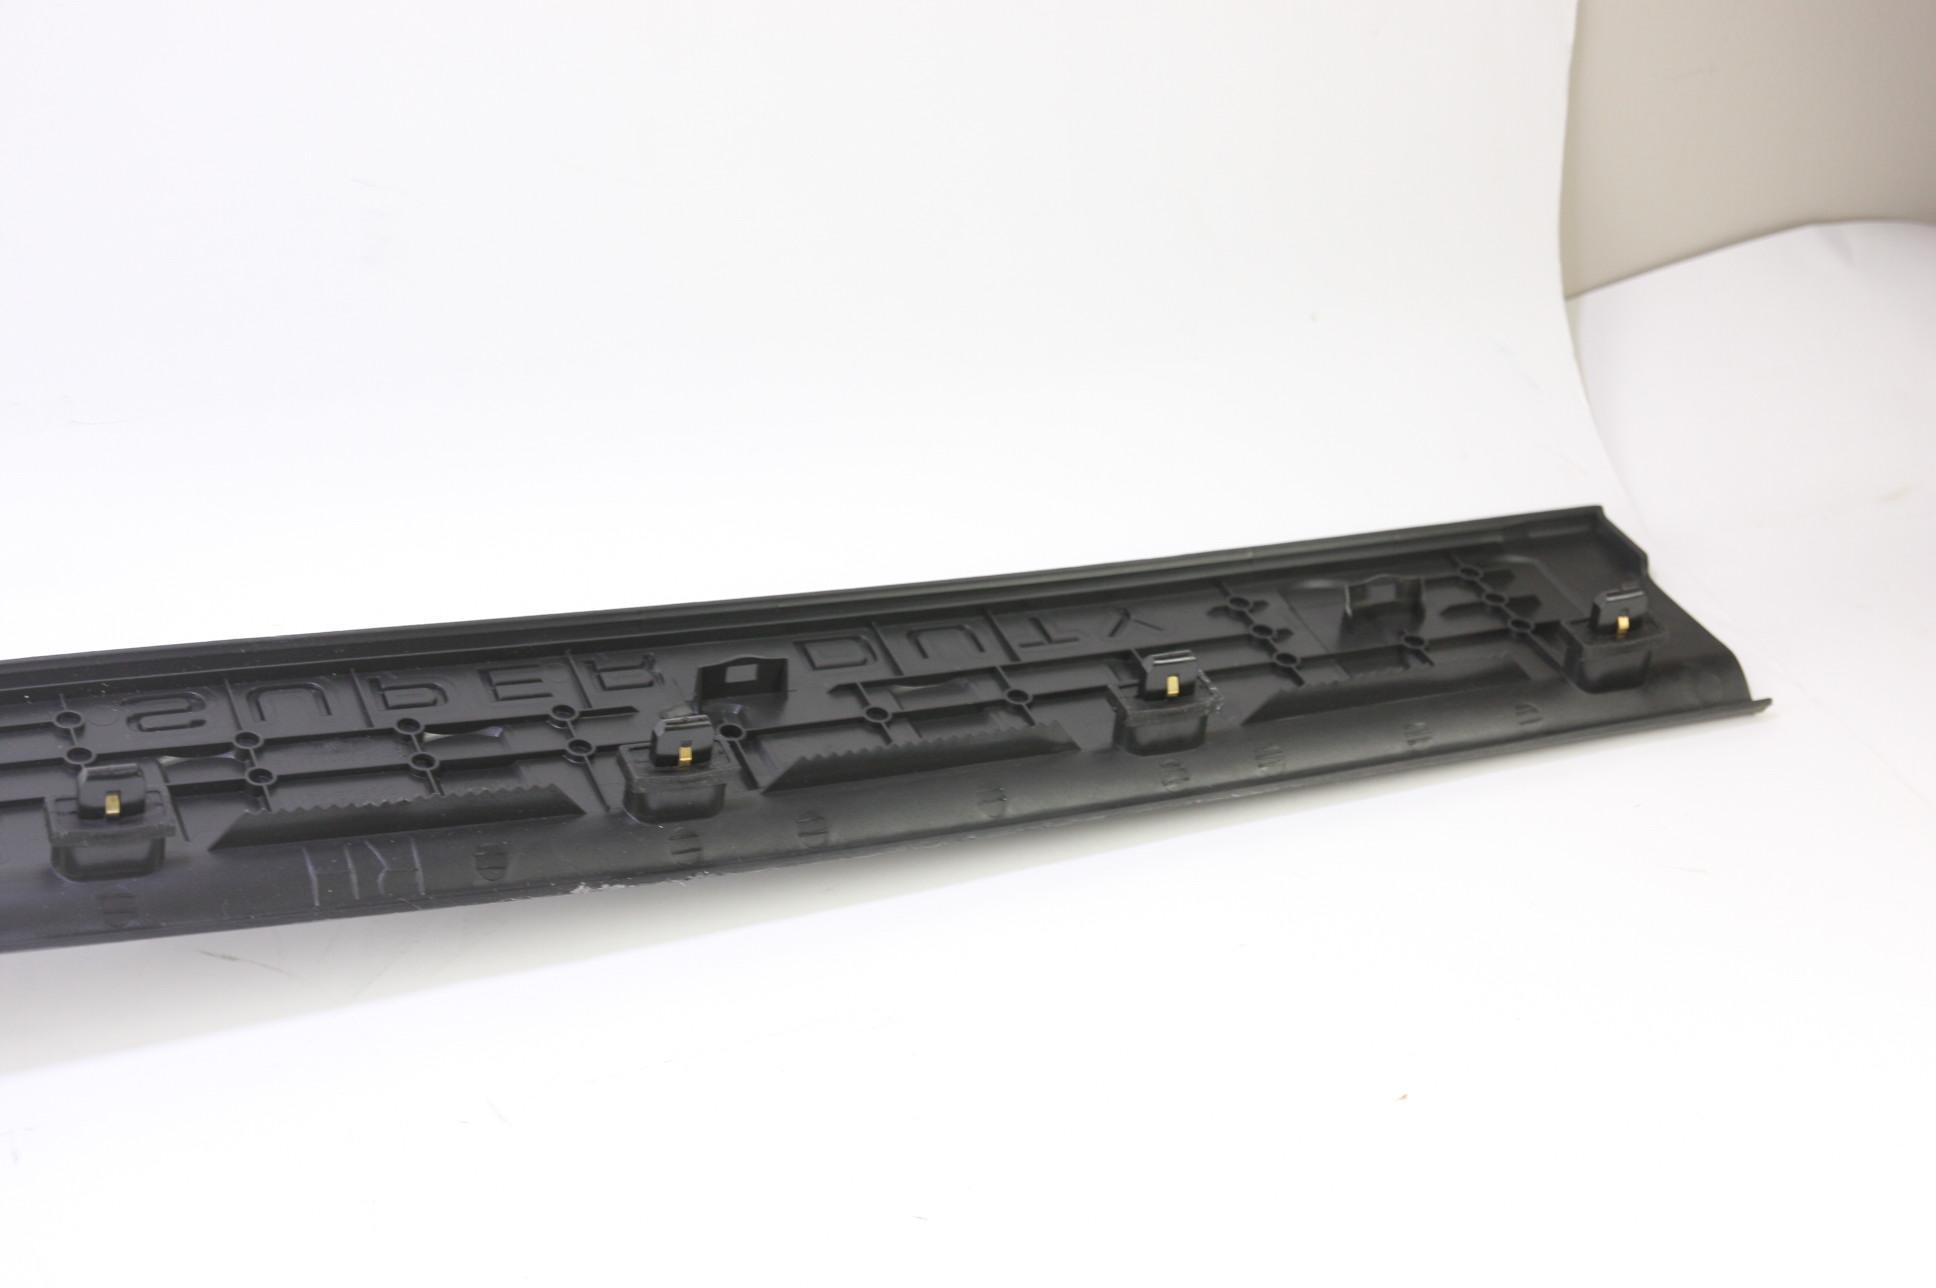 ~ New OEM 9C3Z2813208CA Ford 08-16 F-350 Super Duty Door Sill Scuff Plate RH - image 5